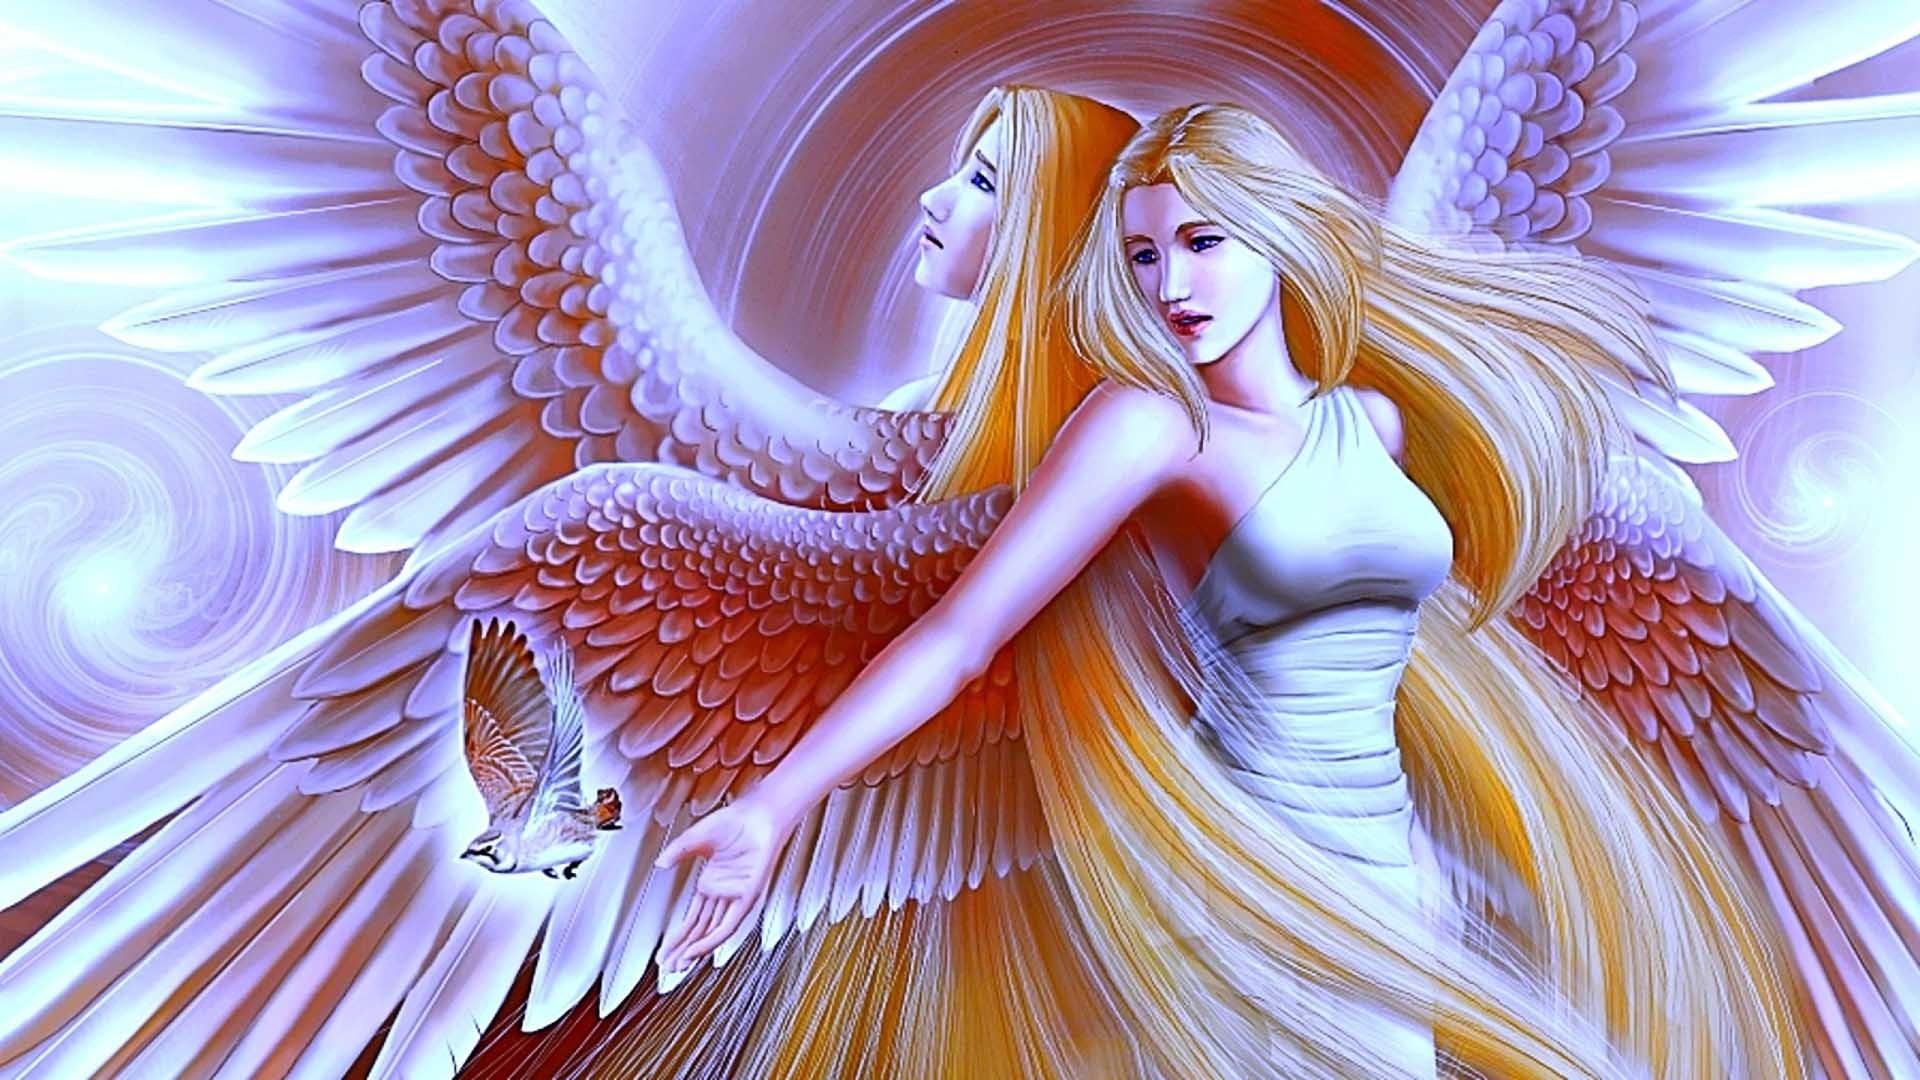 Free Angel Wallpaper Download | Adorable Wallpapers | Pinterest | Angel  wallpaper, Wallpaper and Angel